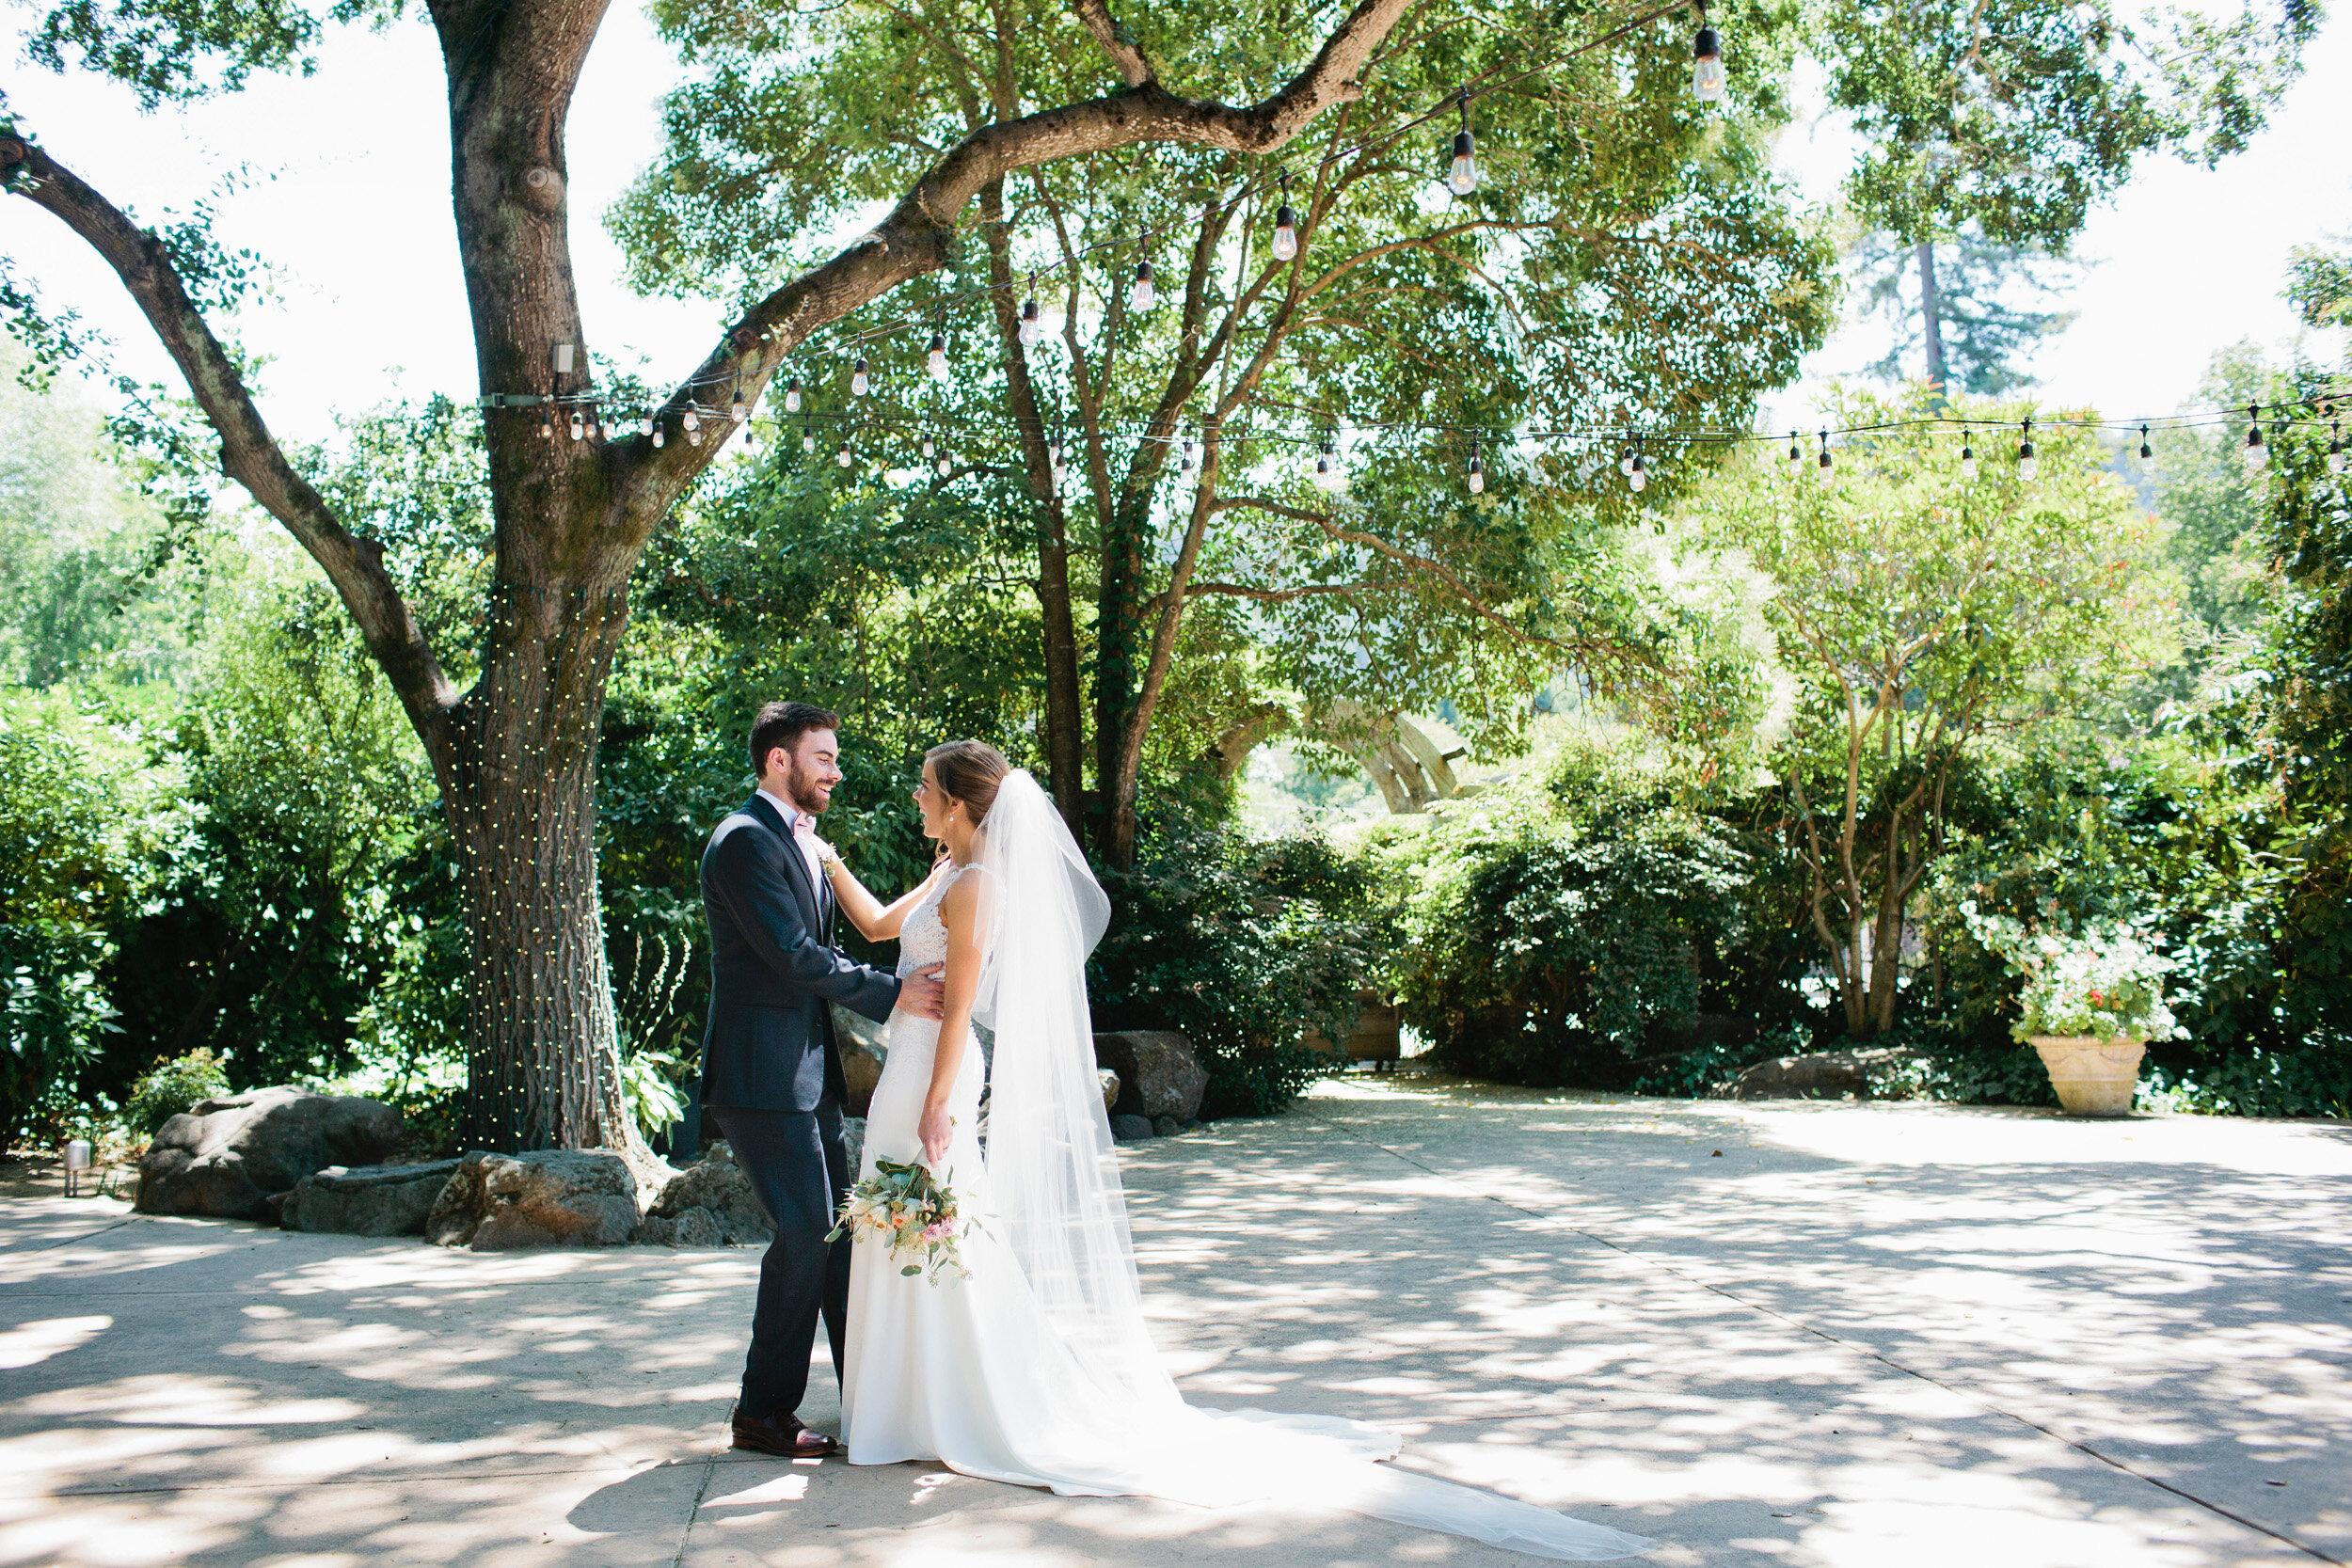 Marin-Art-Garden-Center-Wedding-18.JPG